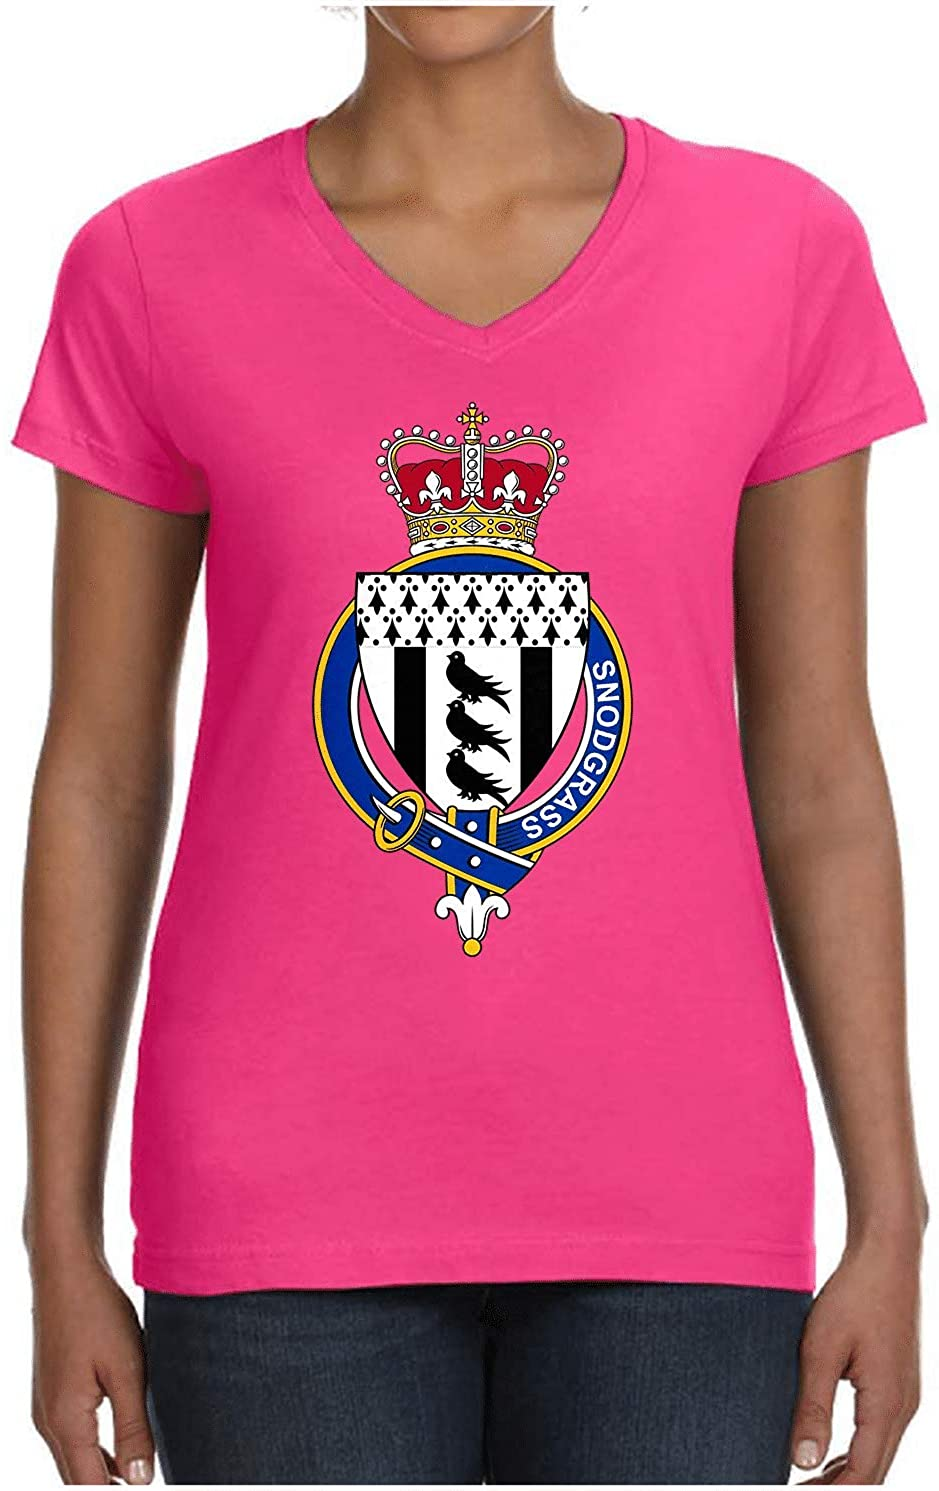 HARD EDGE DESIGN Ladies Scottish Garter Family Snodgrass V Neck T-Shirt, Medium, Hot Pink